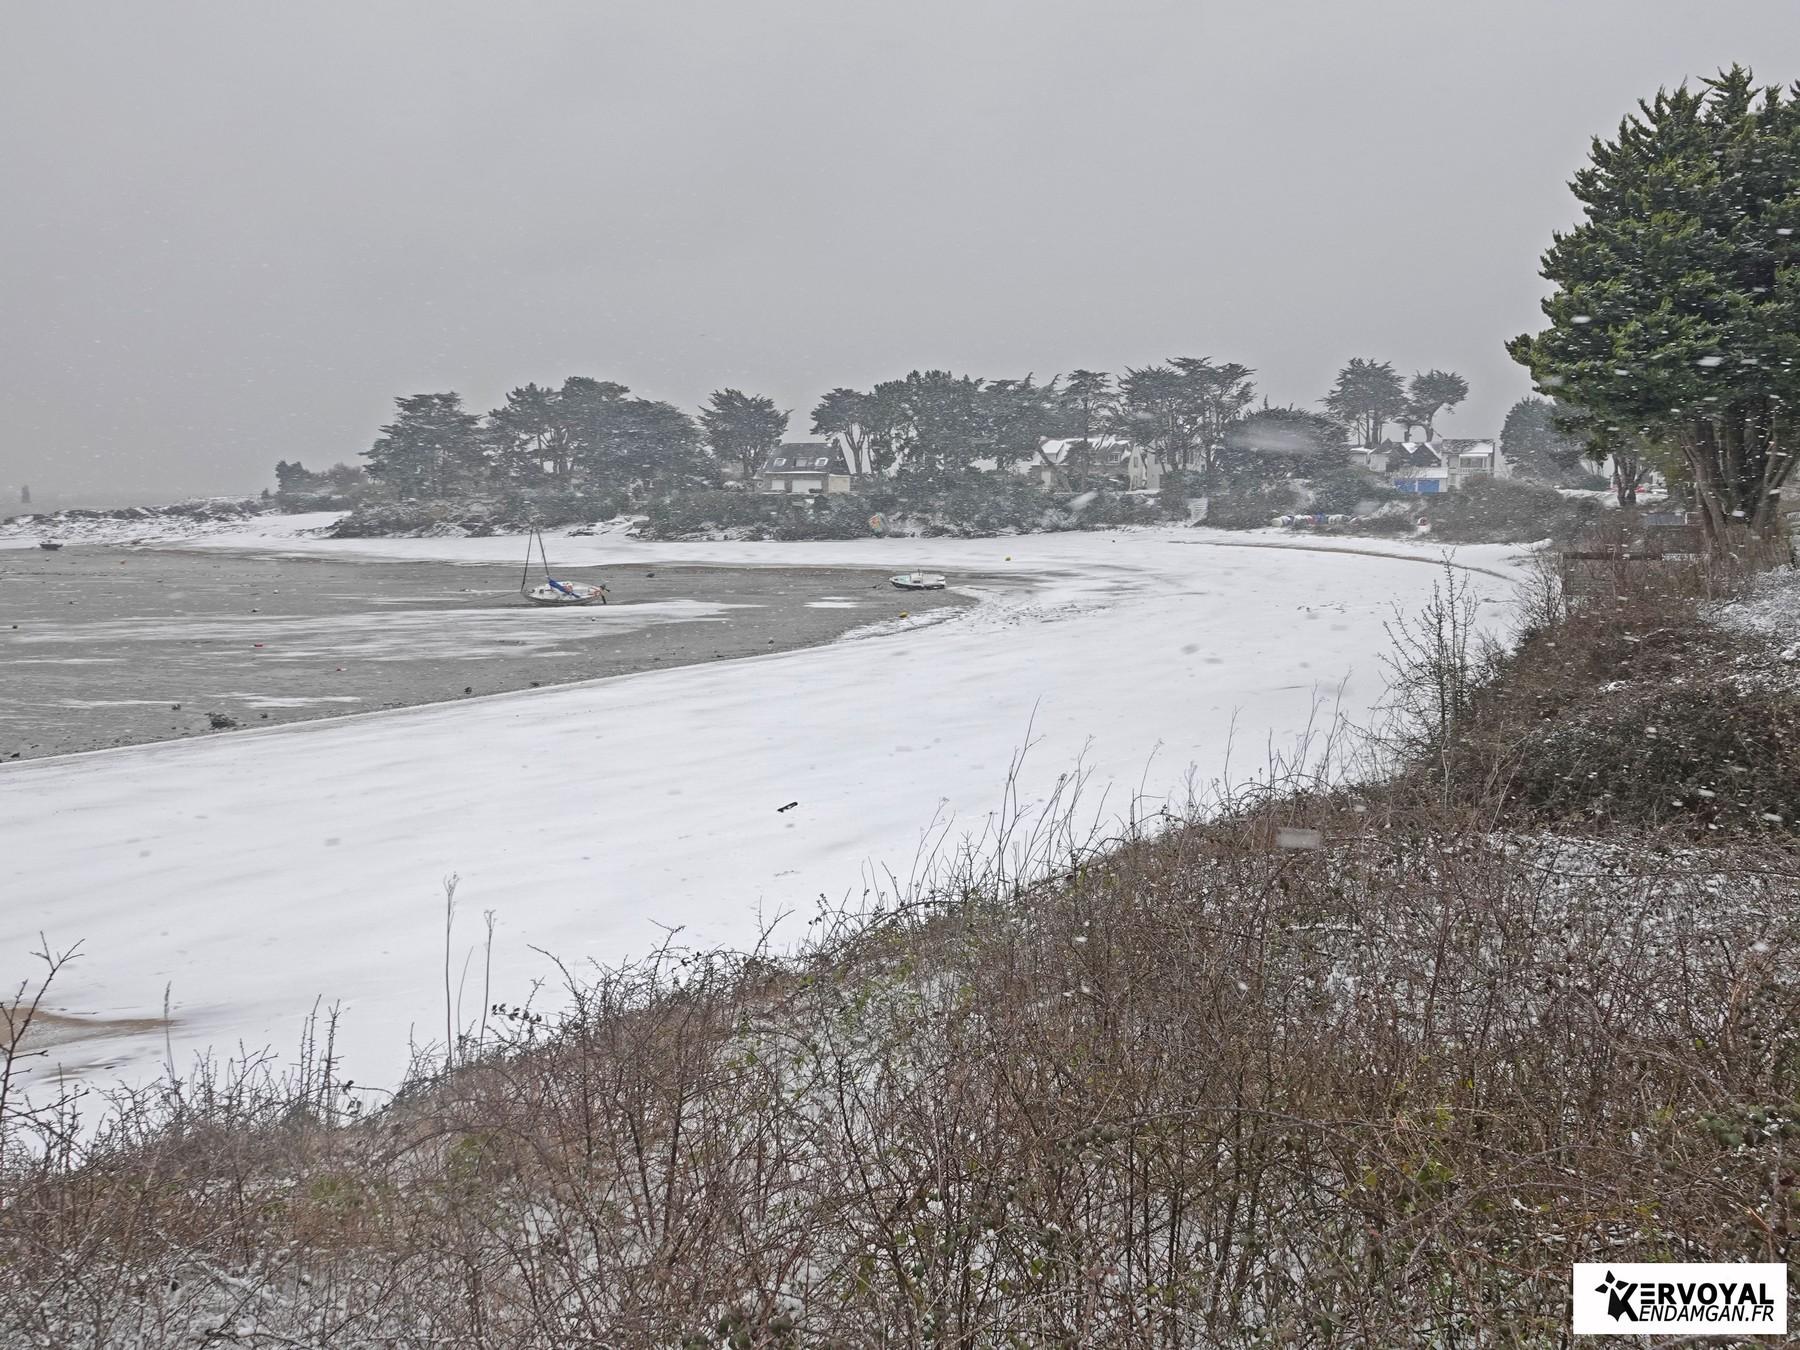 neige à kervoyal 11 février 2021 damgan morbihan (18)